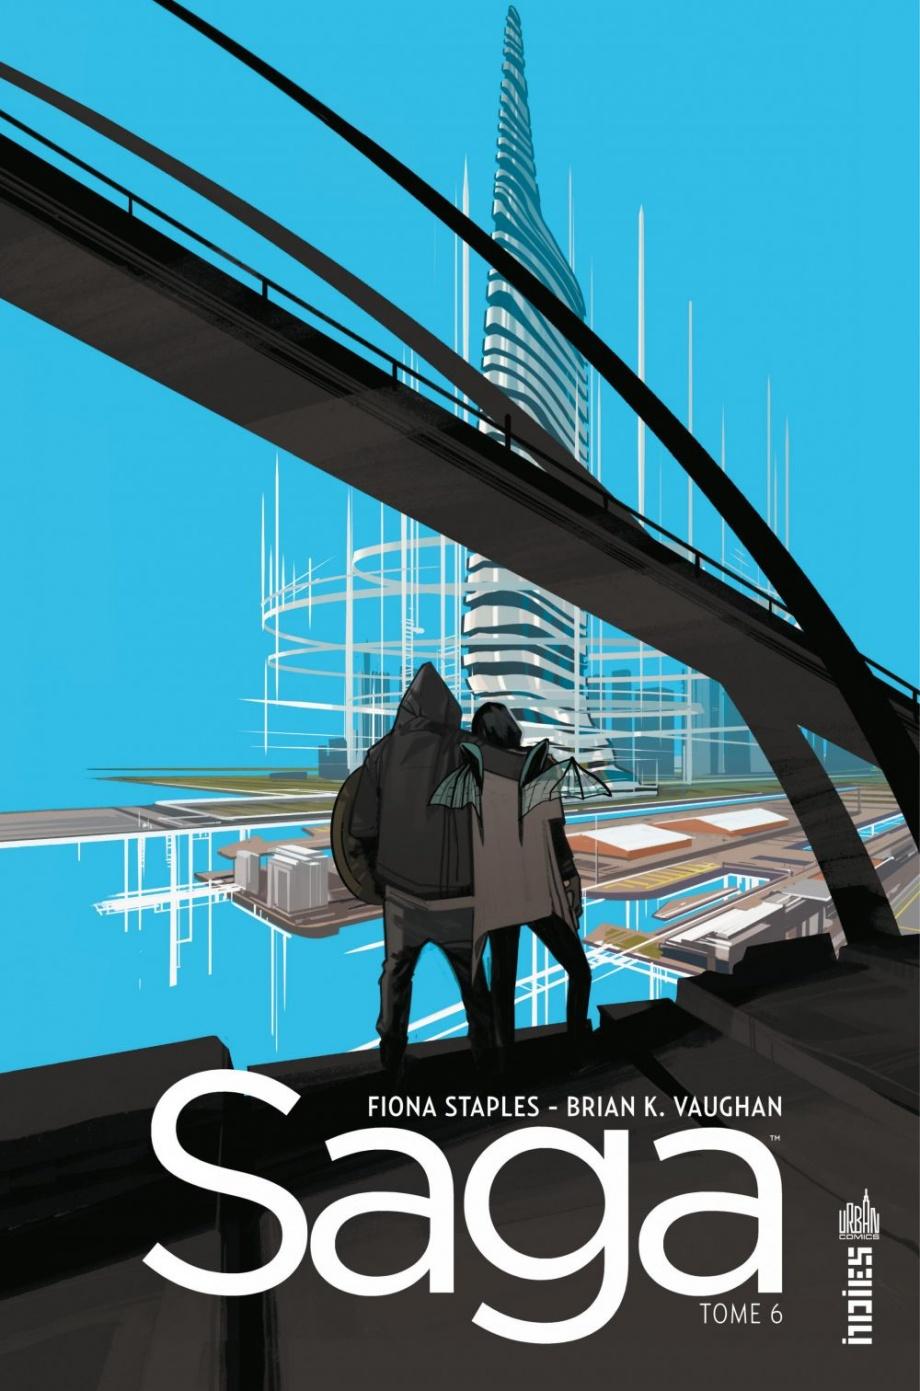 Saga, Tome 6 by Brian K. Vaughan